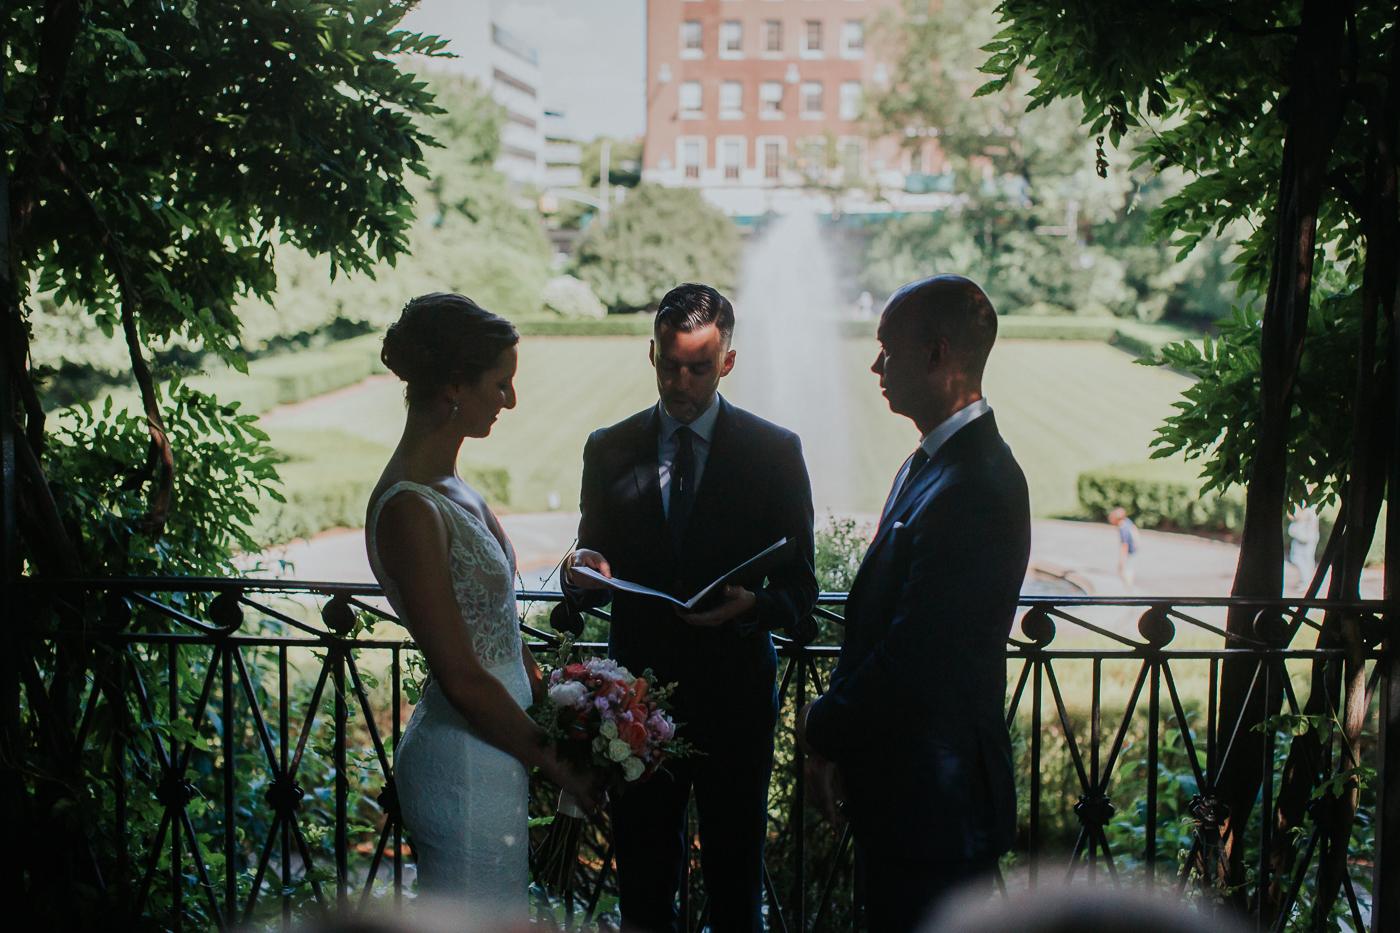 NYC-Central-Park-Conservatory-Garden-Intimate-Elopement-Documentary-Wedding-Photographer-22.jpg